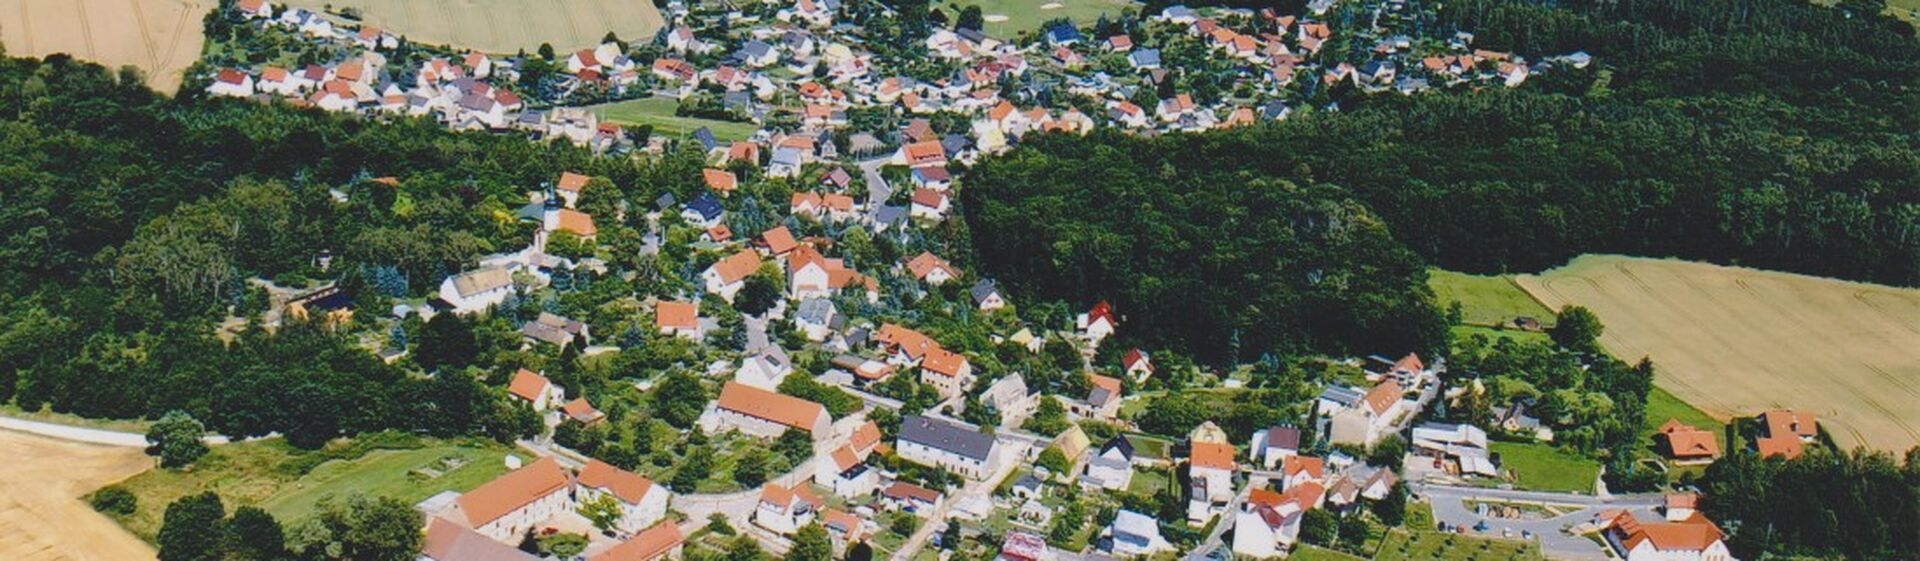 Gemeinde Lödla